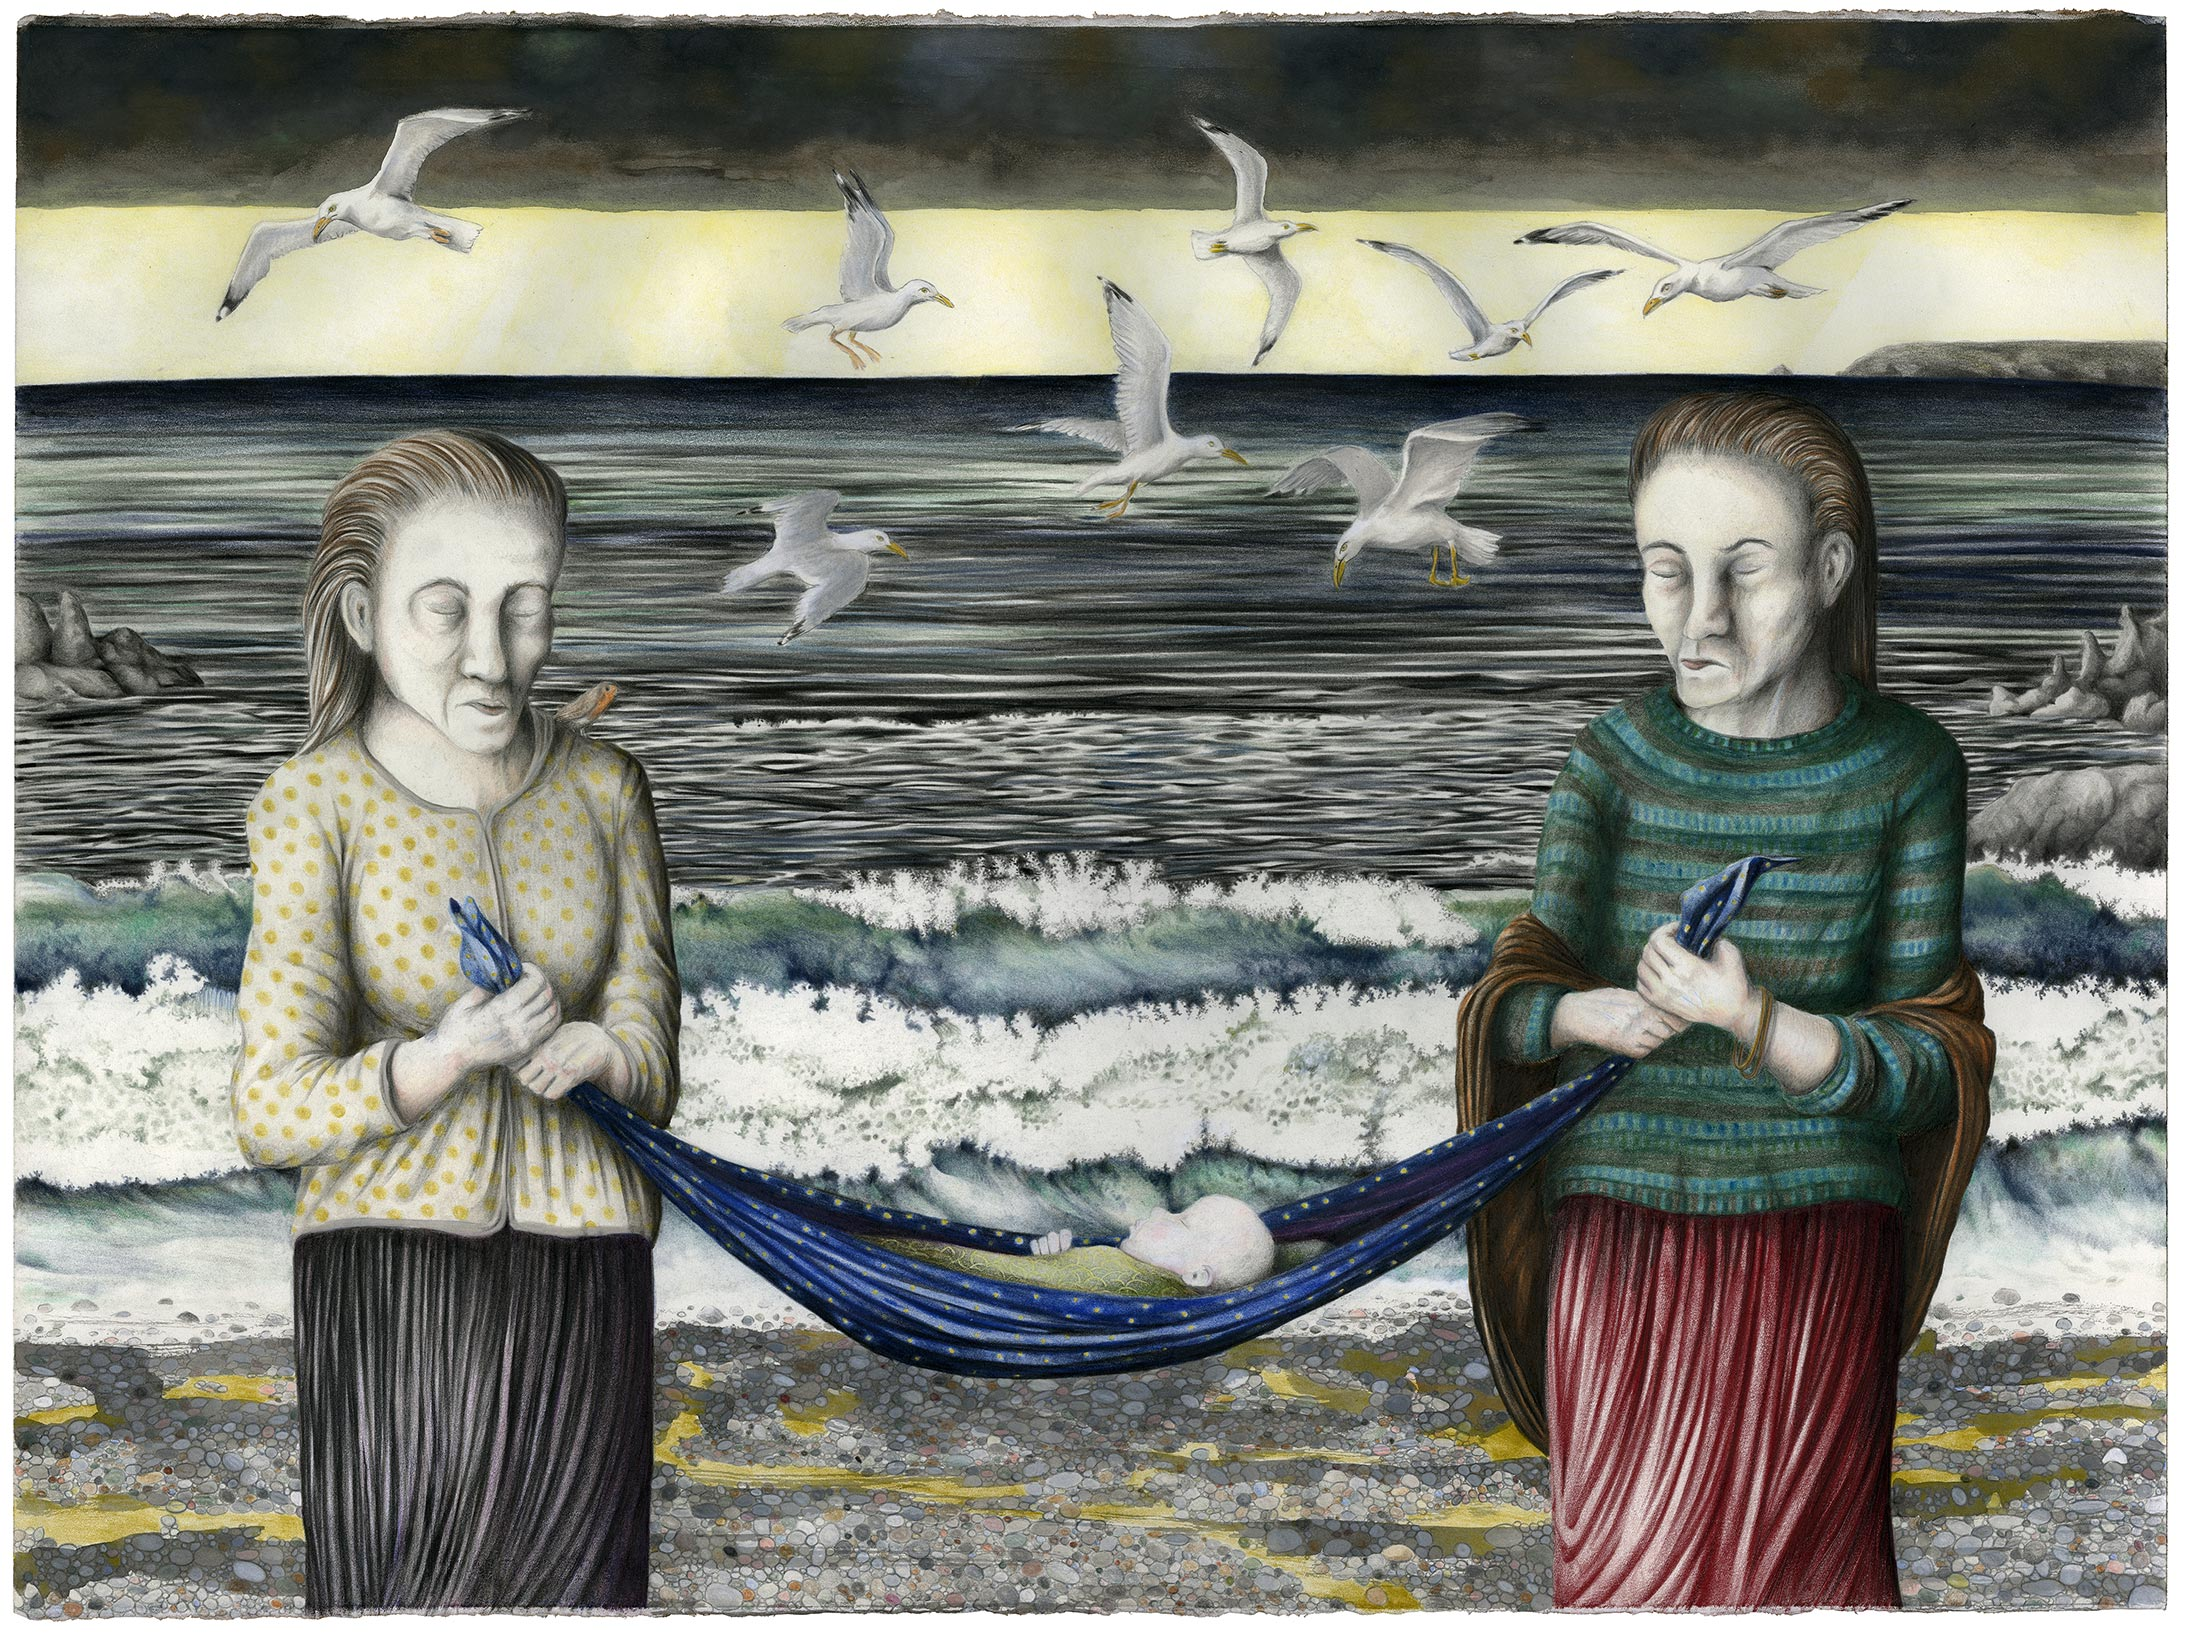 Louise Vercoe, At the Cove, Mixed Media on paper, height 56 cm width 76 cm,  http://www.facebook.com/LouiseVercoe.art